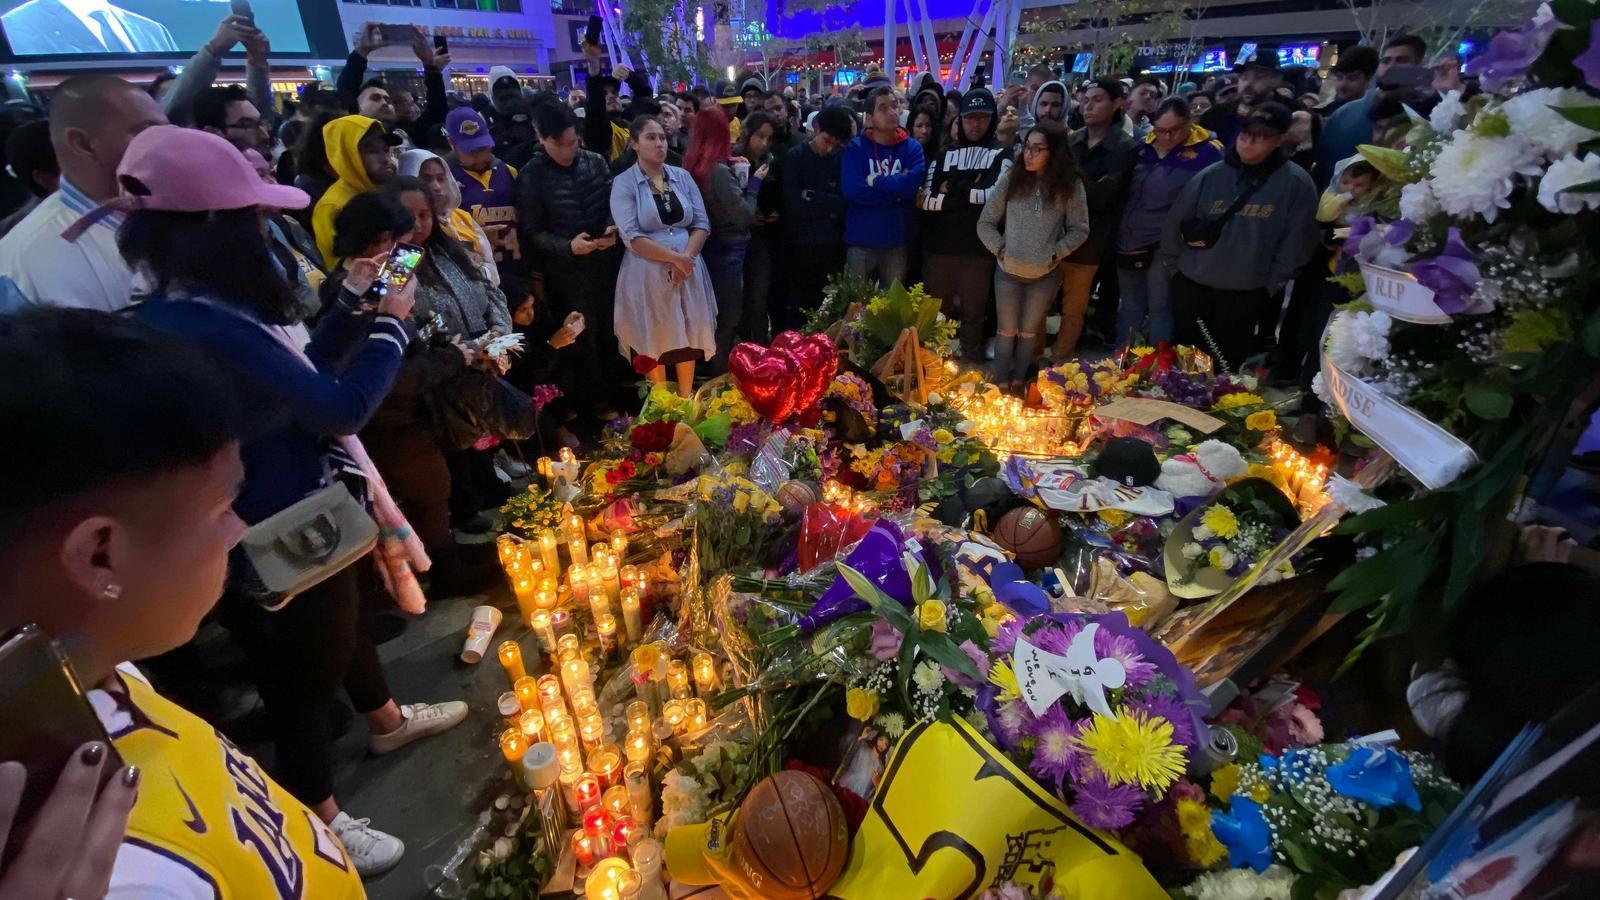 Homenatge a Kobe Bryant, a l'Staples Center